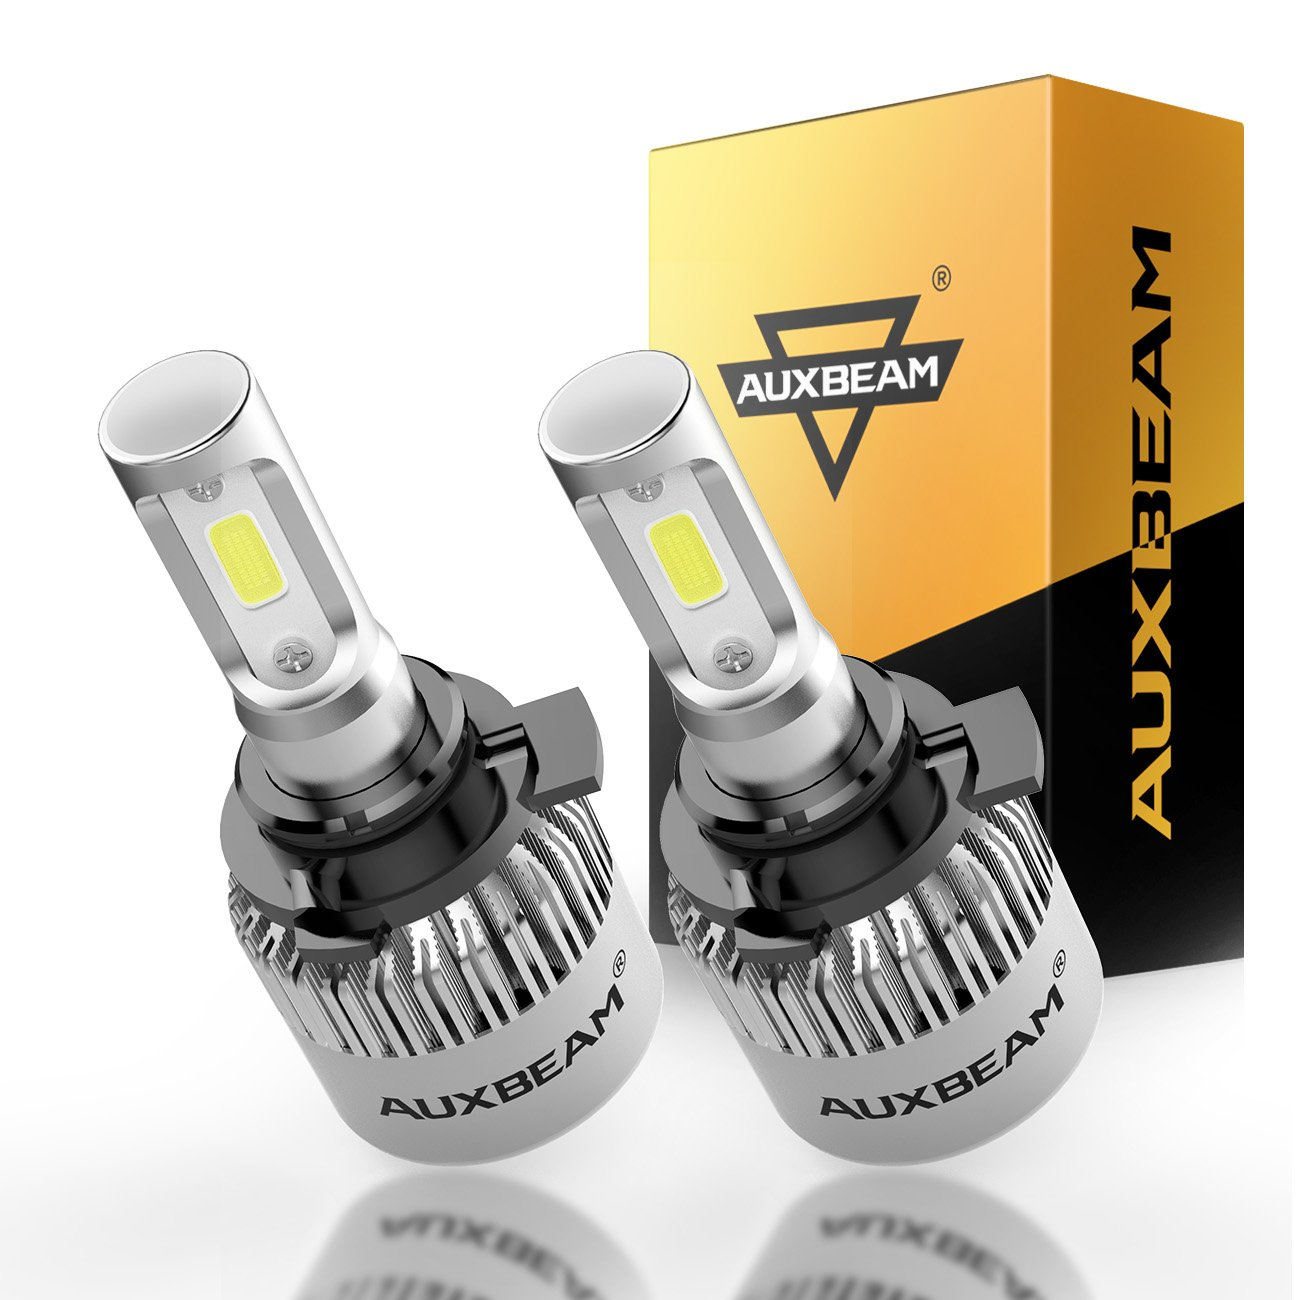 Auxbeam LED Headlight Bulb F-S2 Series LED Headlights with 2 Pcs of H13 9008 H13A P264T PJ264T LED Headlight Bulbs Hi-Lo Beam Bridgelux COB72W 8000lm - 1 Year Warranty